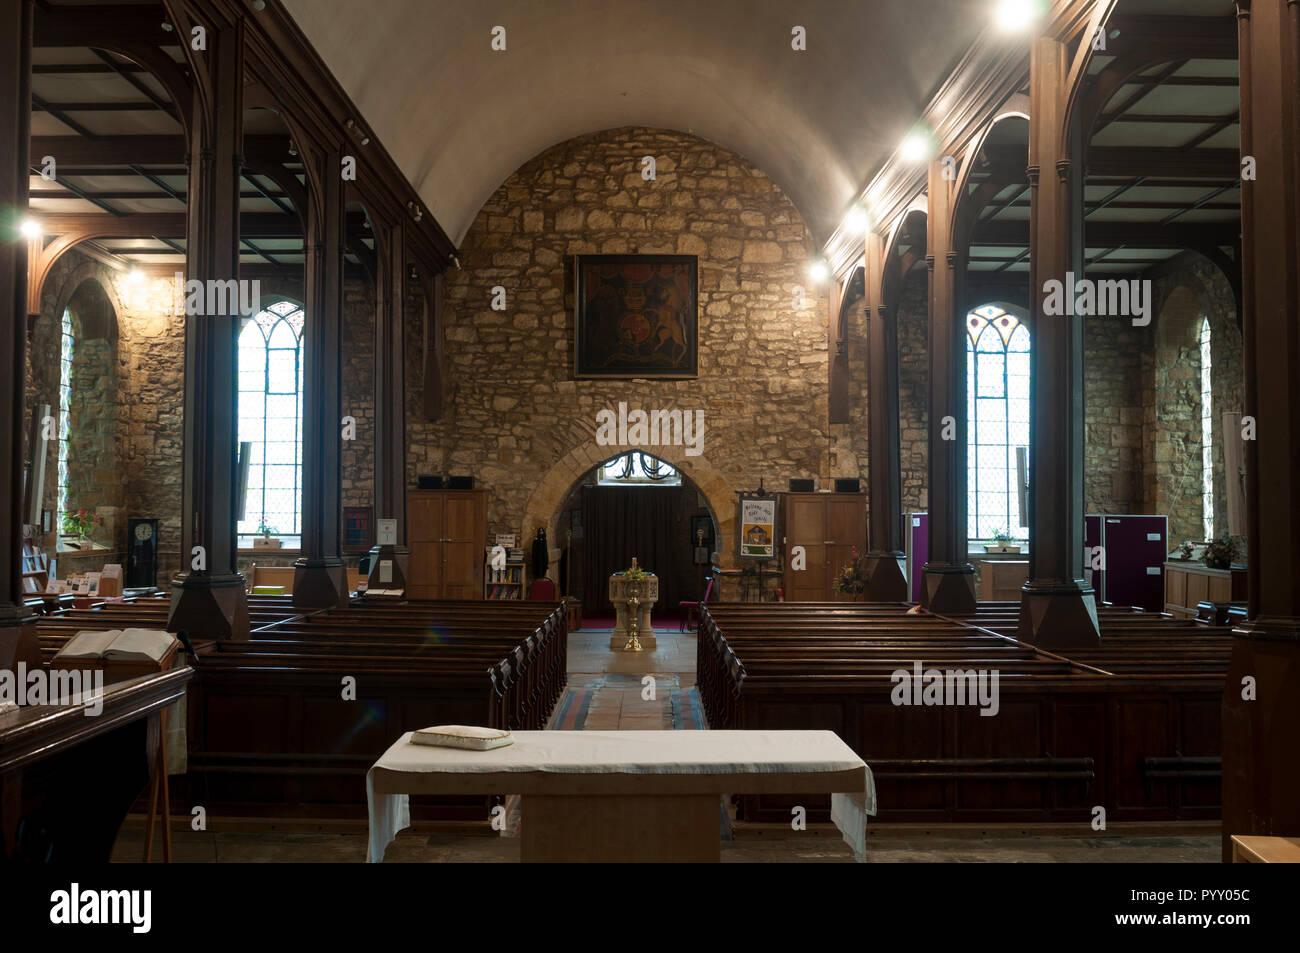 St. Peter and St. Paul`s Church, Weedon, Northamptonshire, England, UK - Stock Image